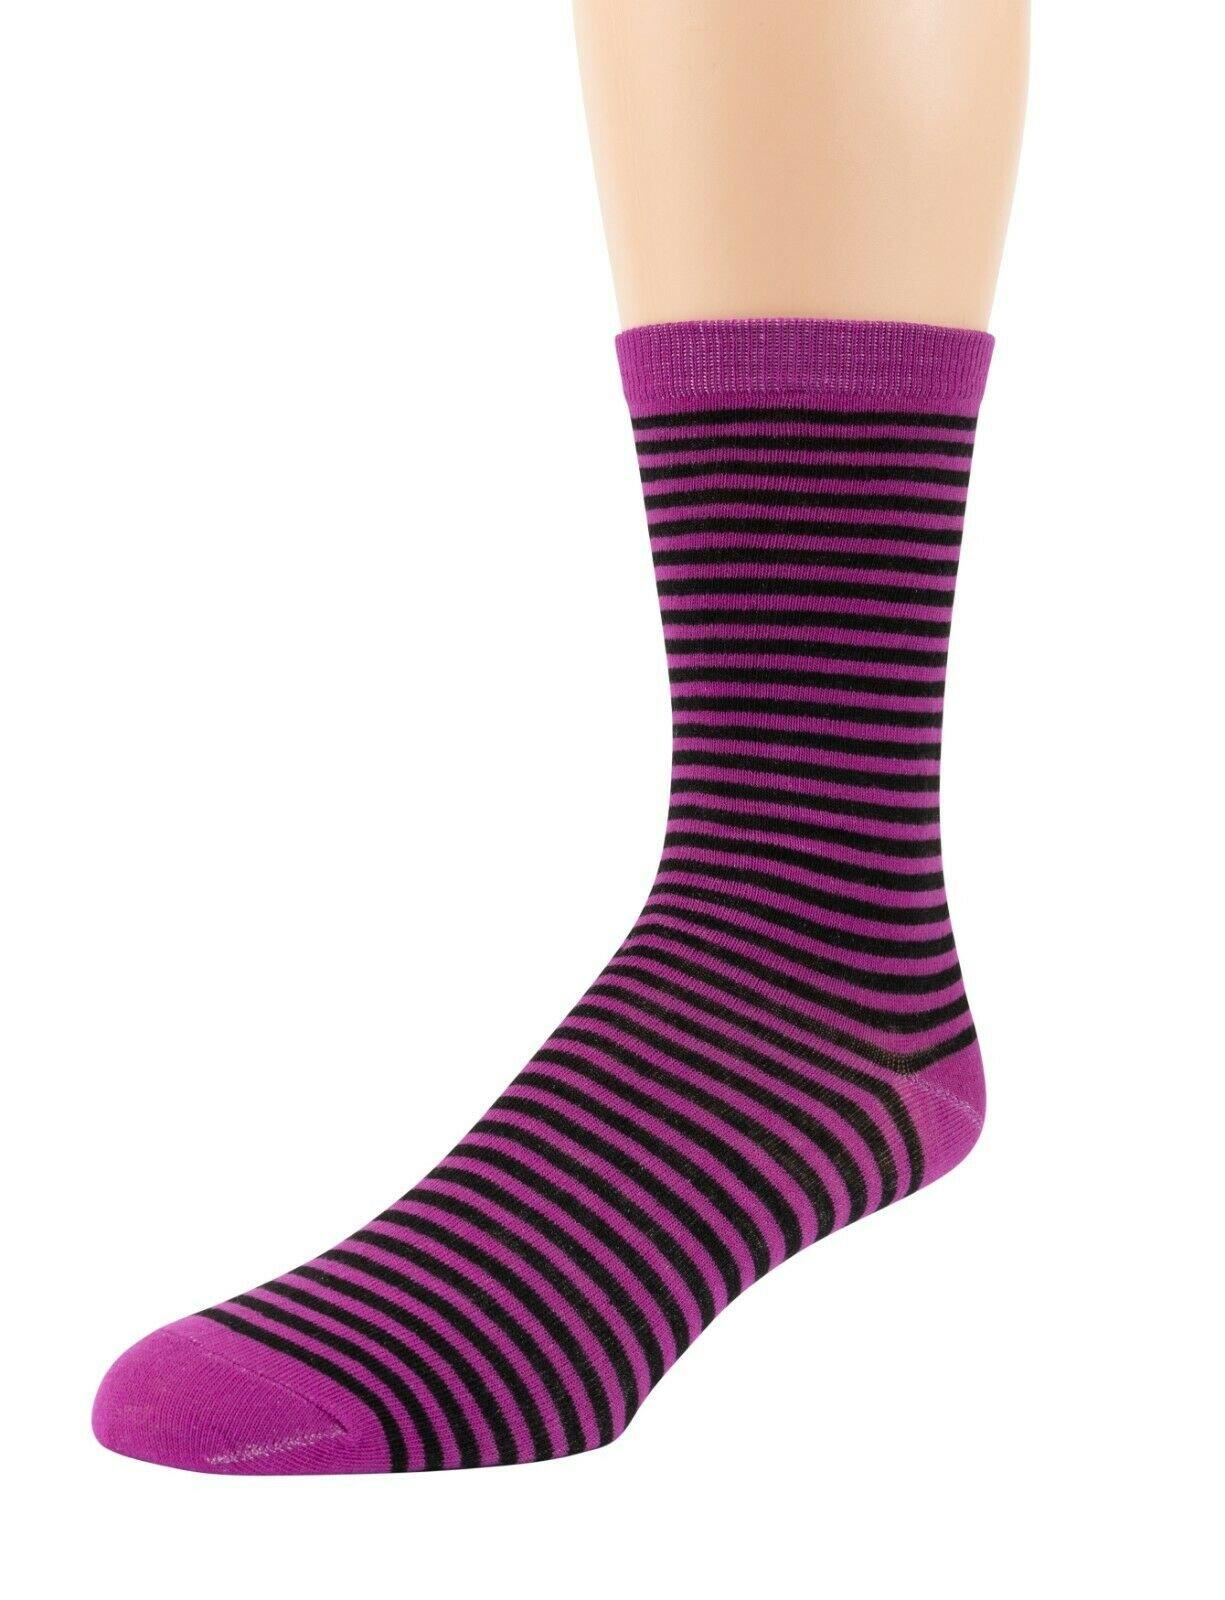 Mitch-Bogen-Mens-Cotton-Dress-Socks-Colorful-Fashion-Crew-Socks-8-Pack-Gift-Box thumbnail 35